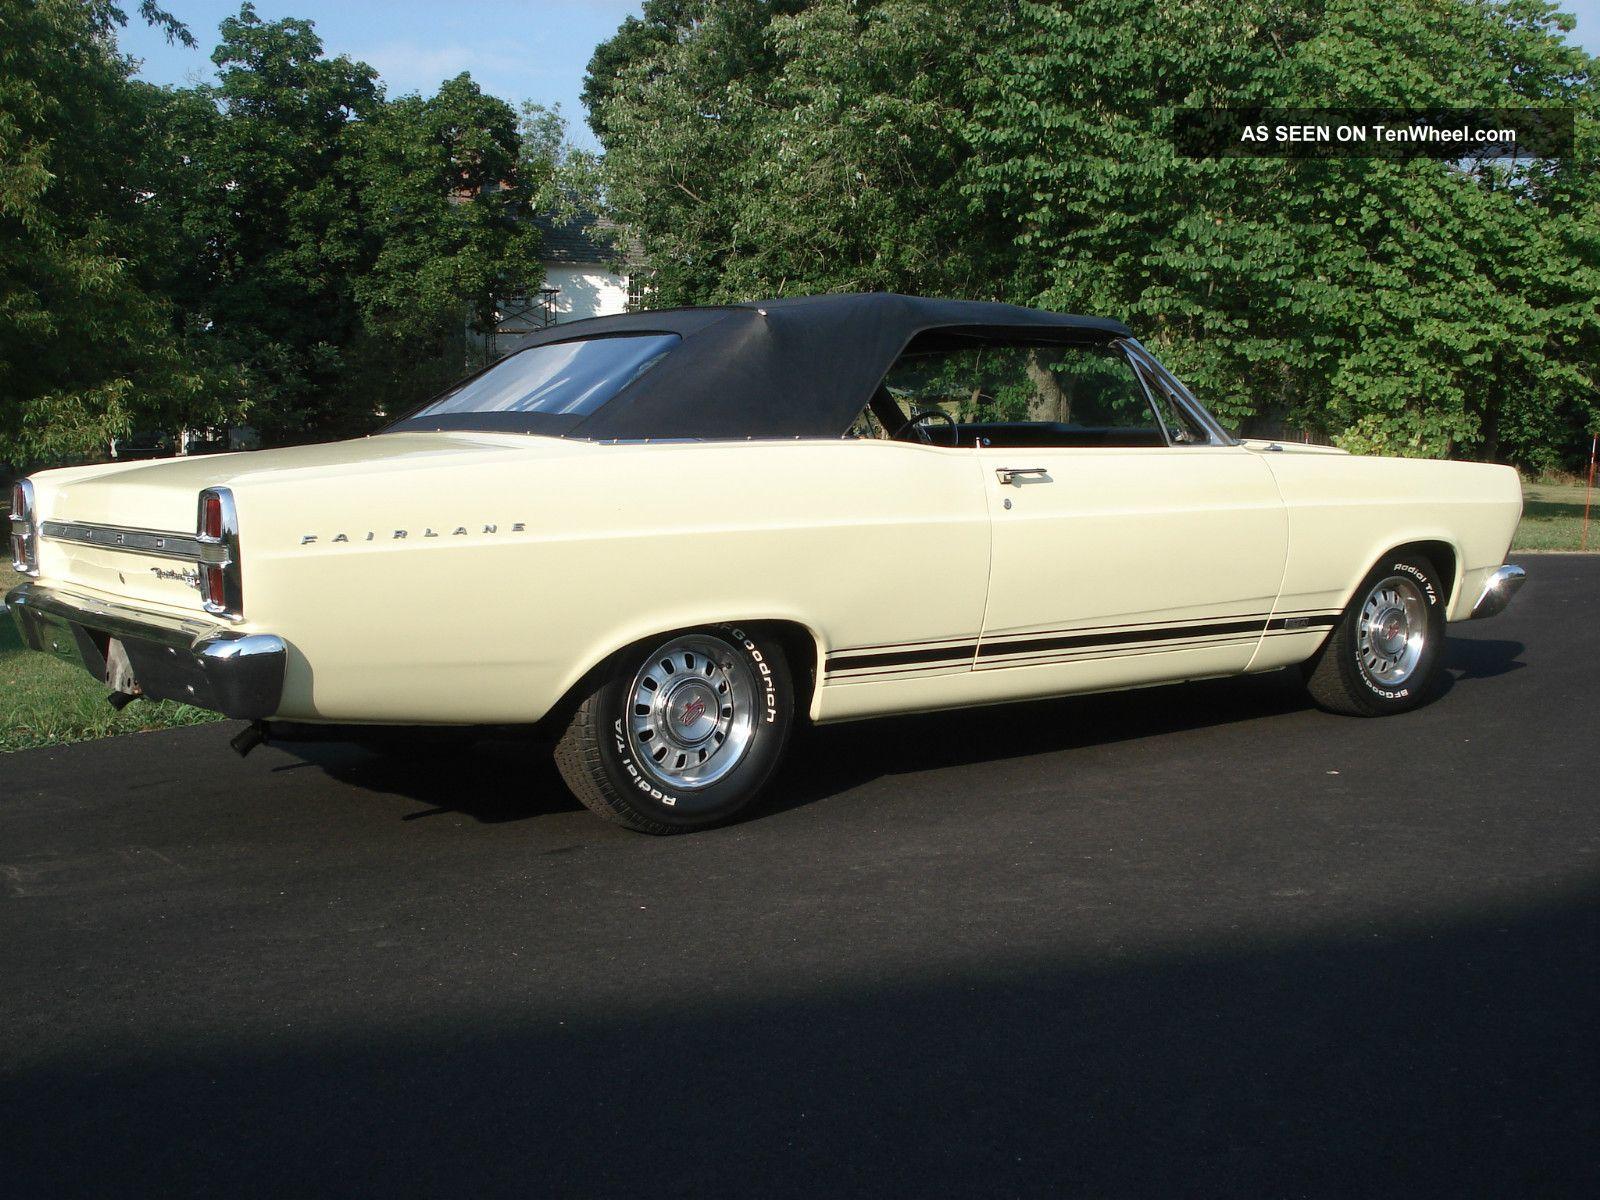 1967 ford fairlane gta 390 convertible